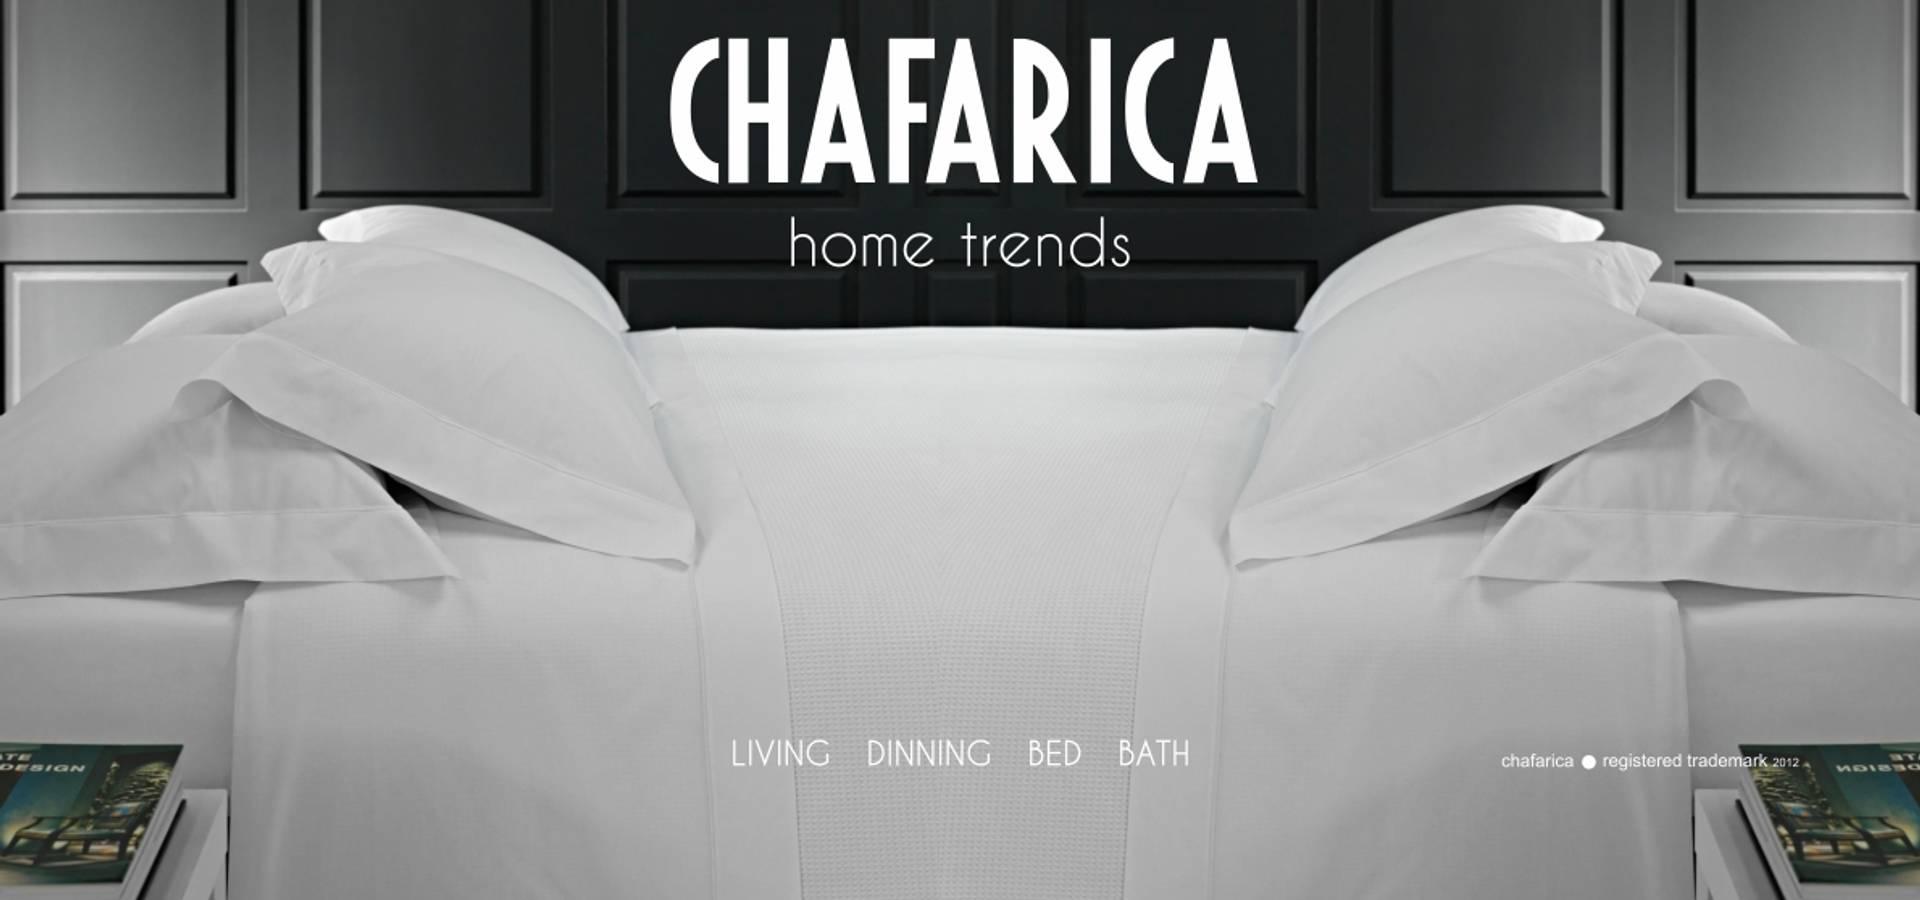 Chafarica